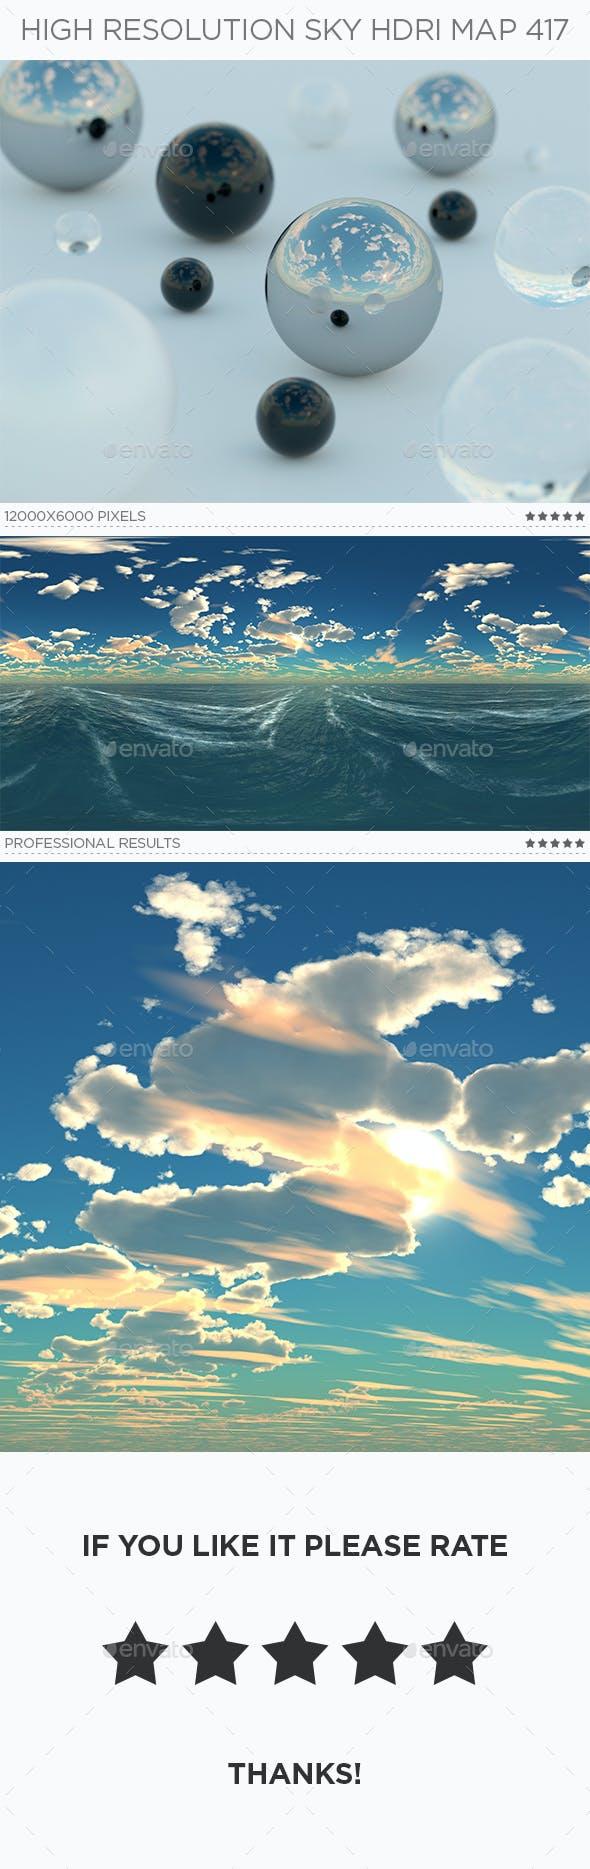 High Resolution Sky HDRi Map 417 - 3DOcean Item for Sale